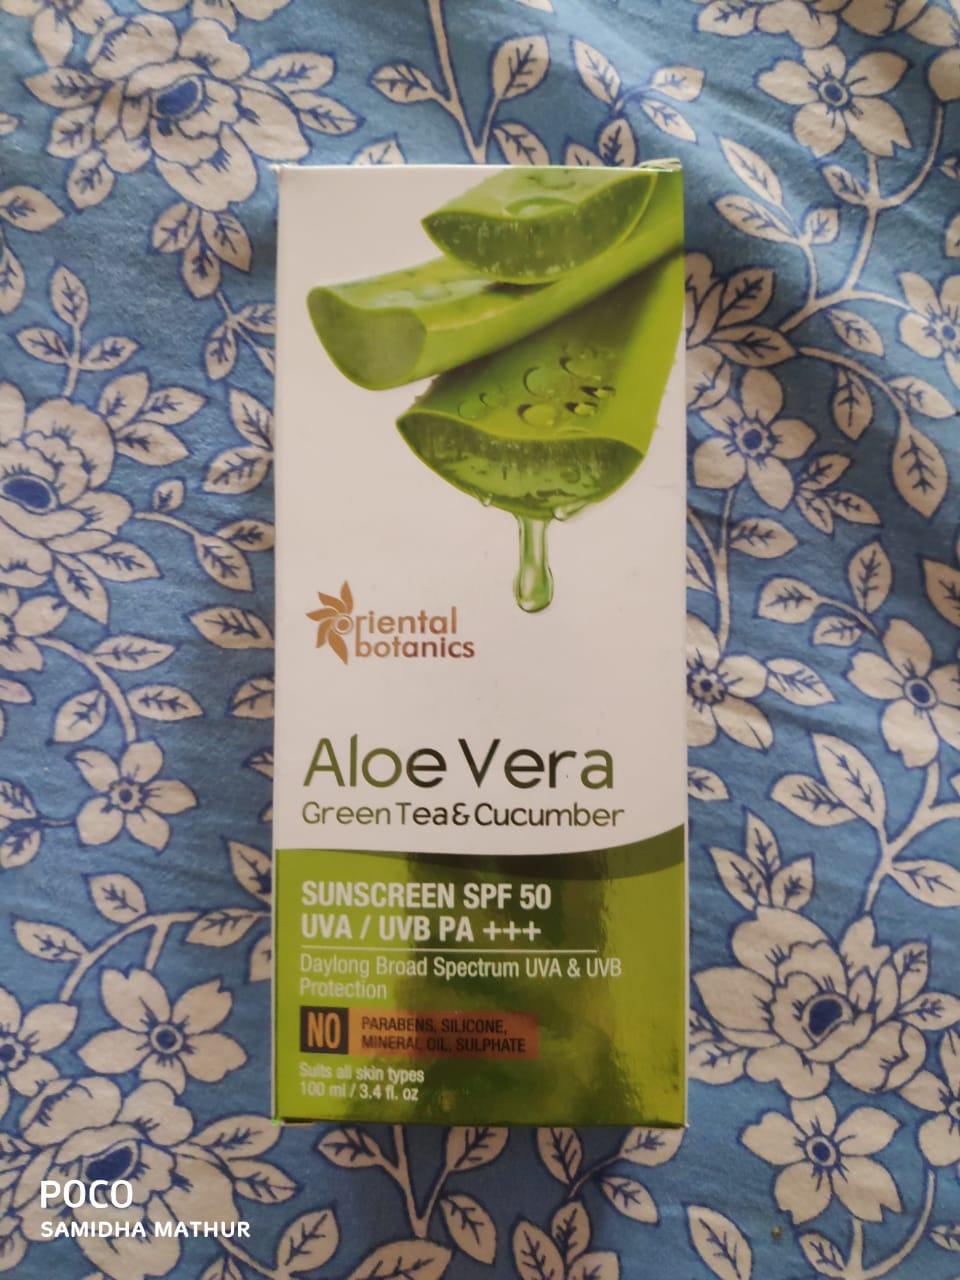 Oriental Botanics Aloe Vera Green Tea & Cucumber Sunscreen SPF 50-A Good Product-By Samidha_Mathur-2